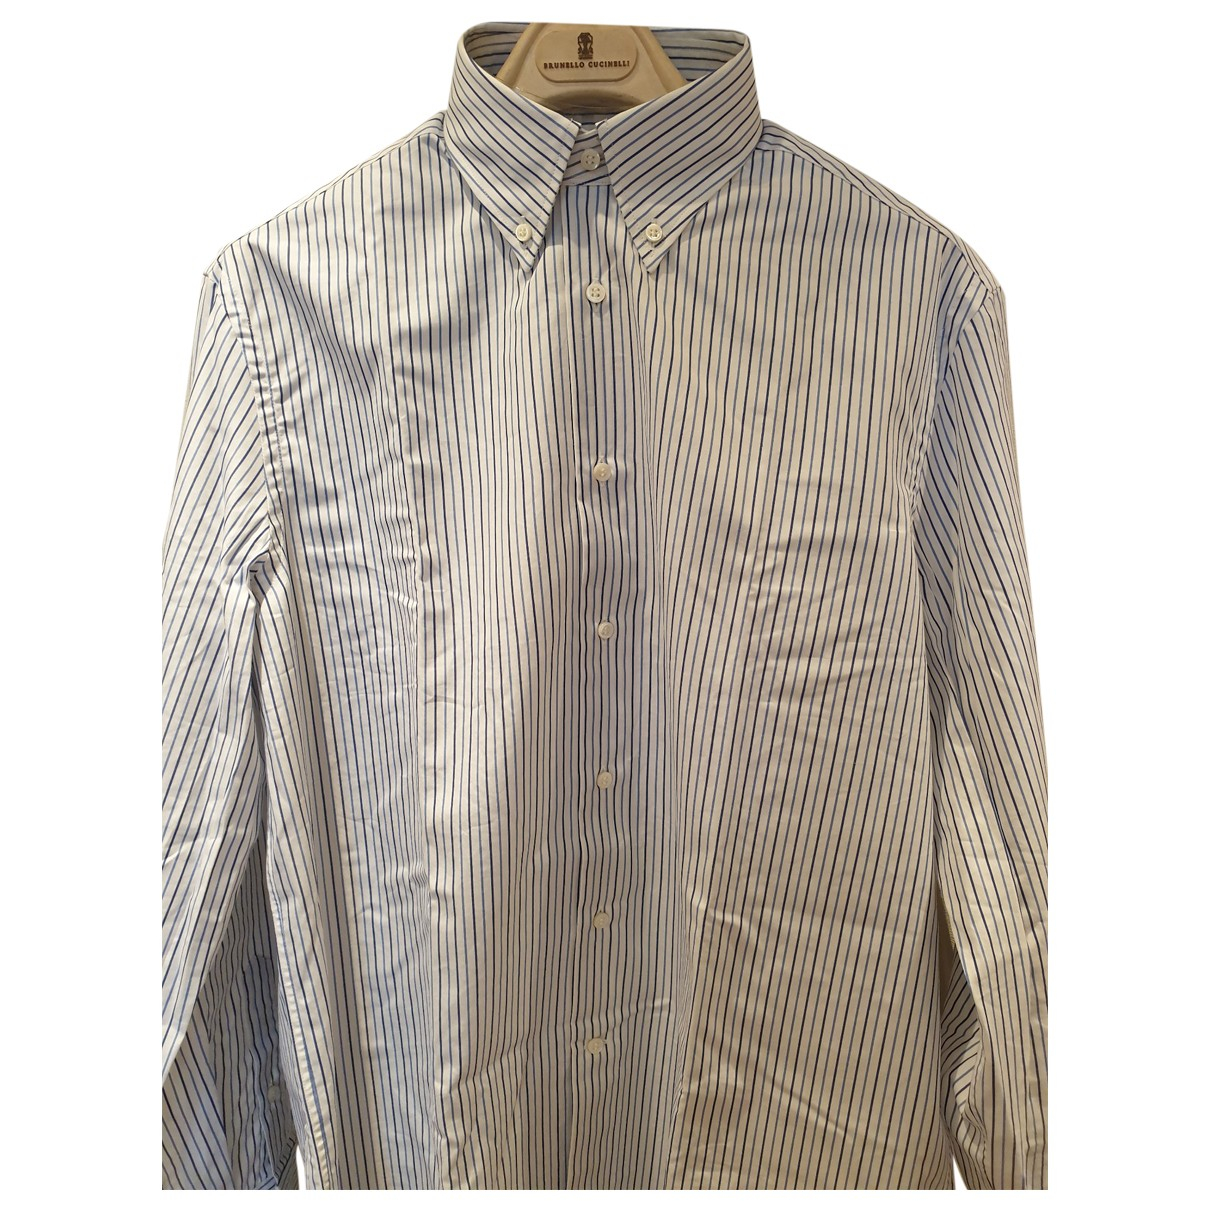 Brunello Cucinelli \N Blue Cotton Shirts for Men L International